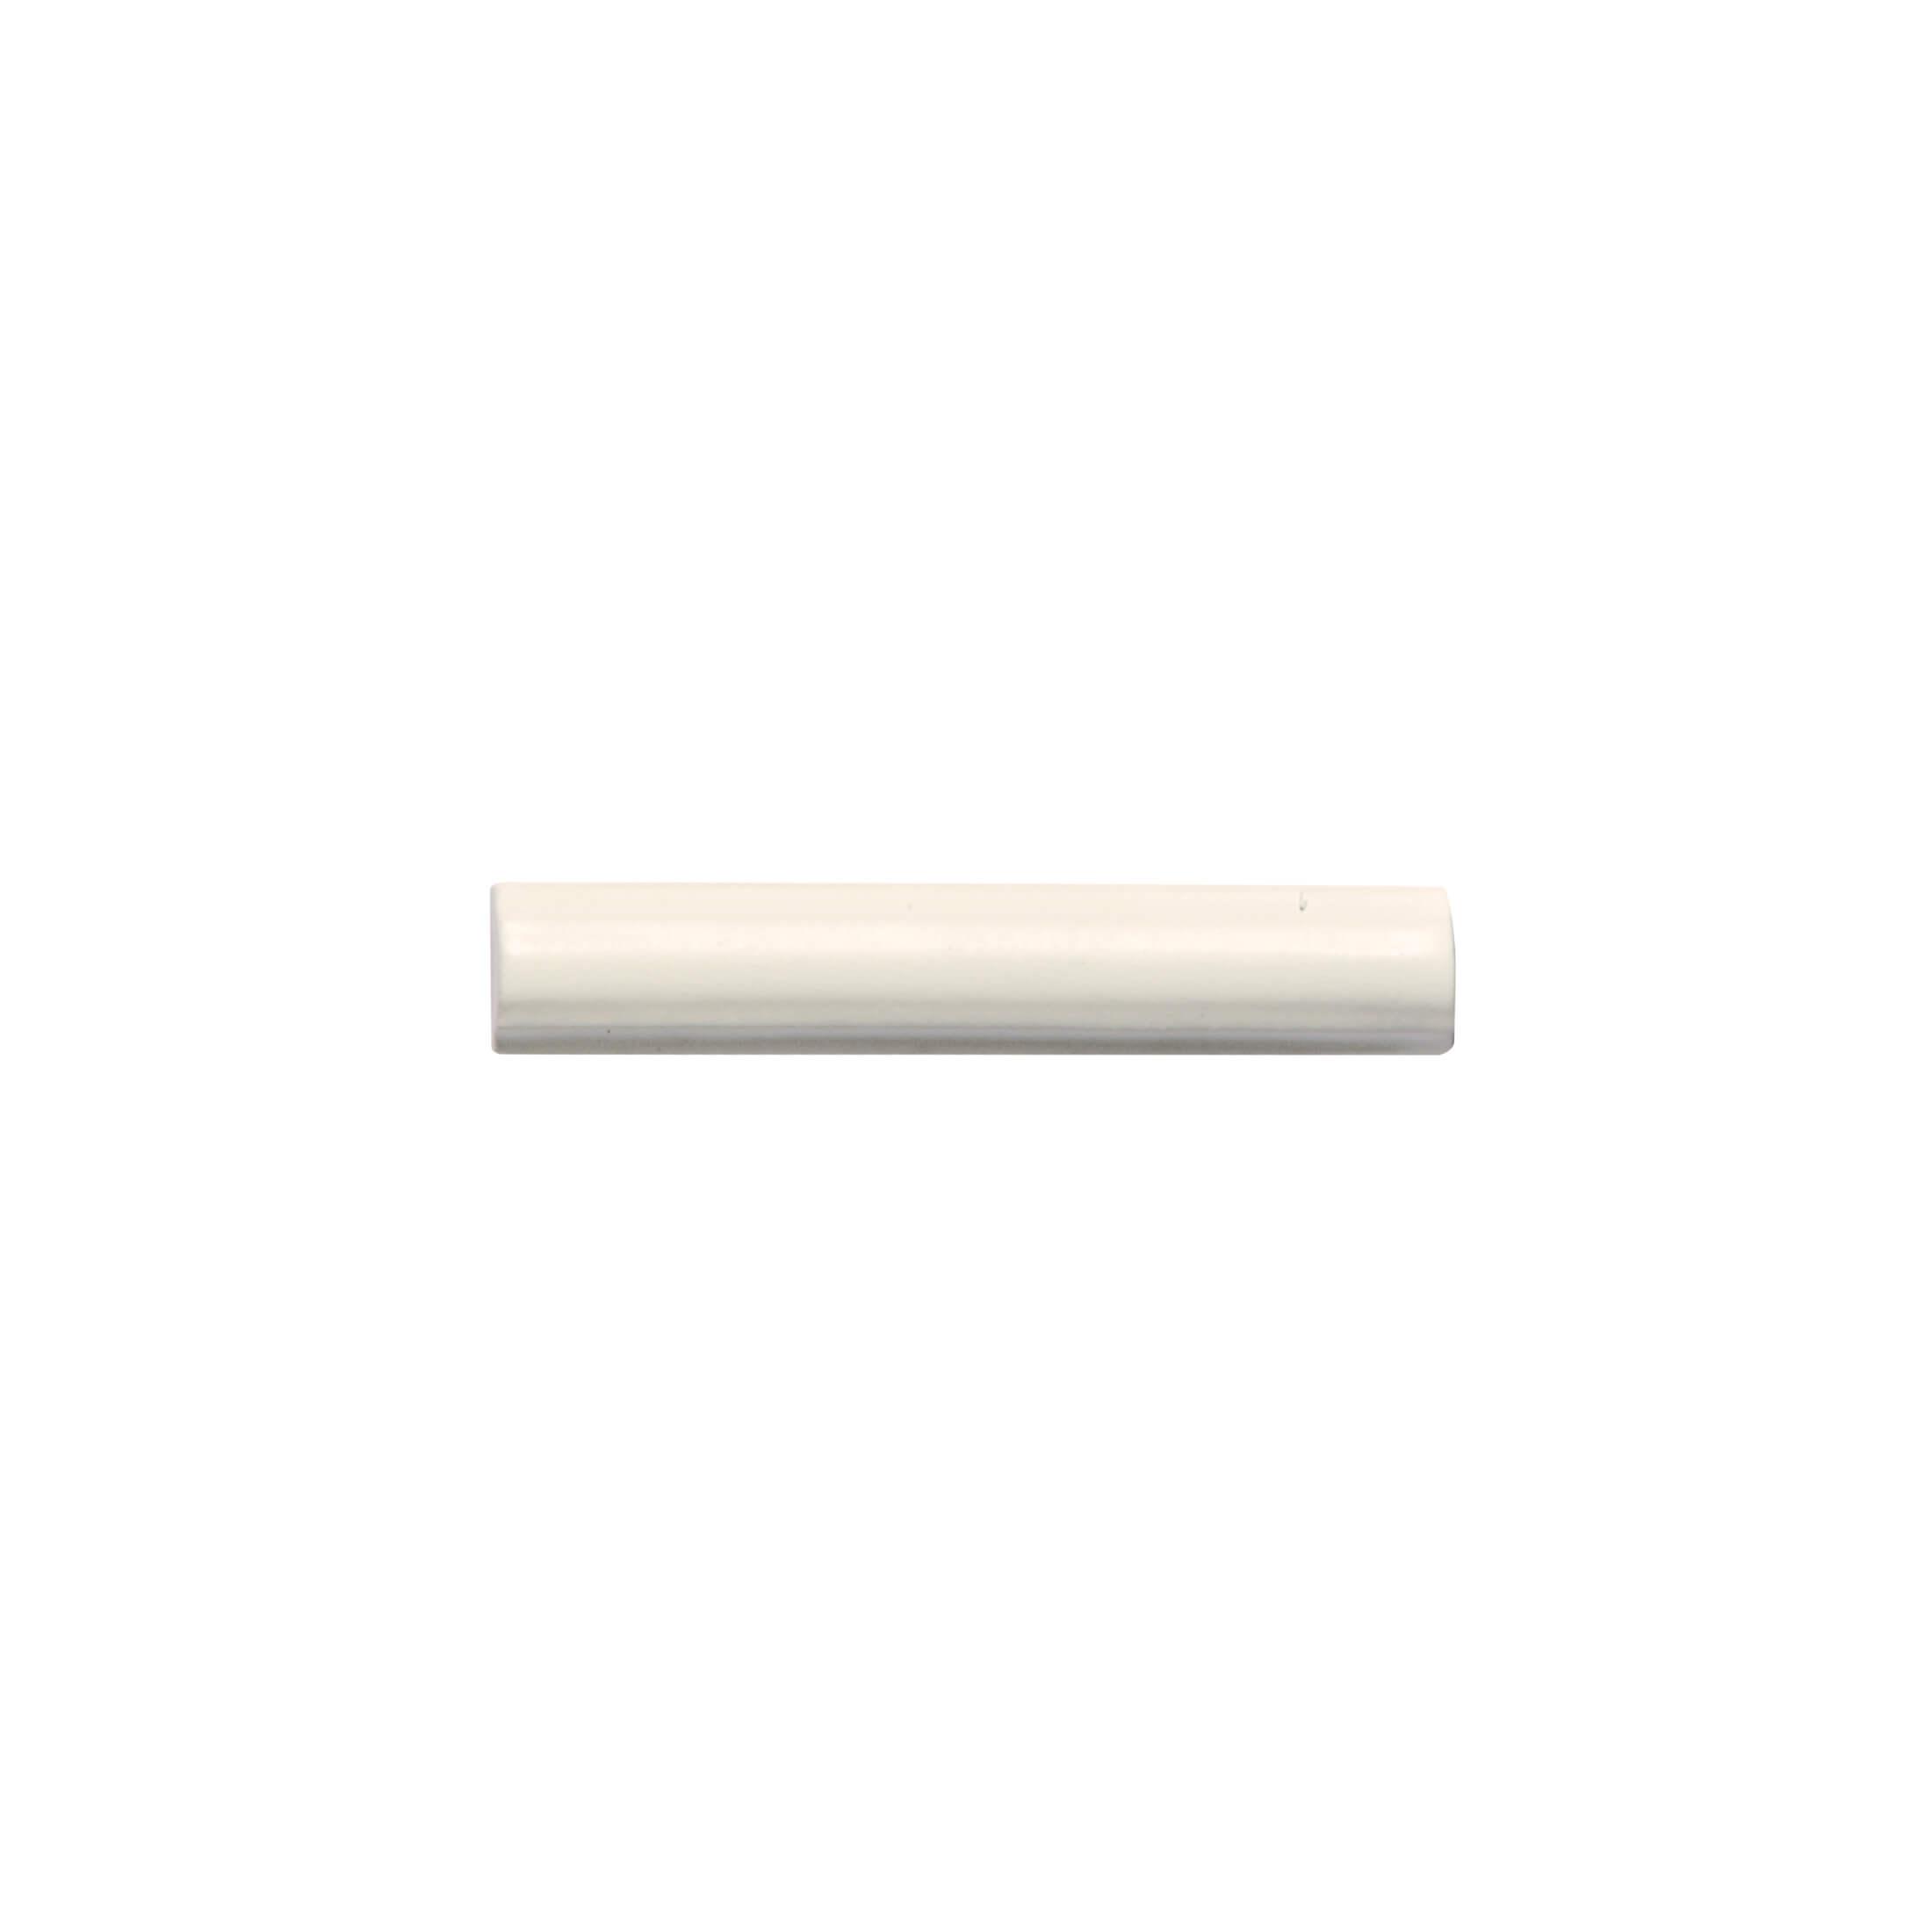 ADEX-ADNT5023-BARRA-RELIEVE-2.5 cm-15 cm-NATURE>LINEN